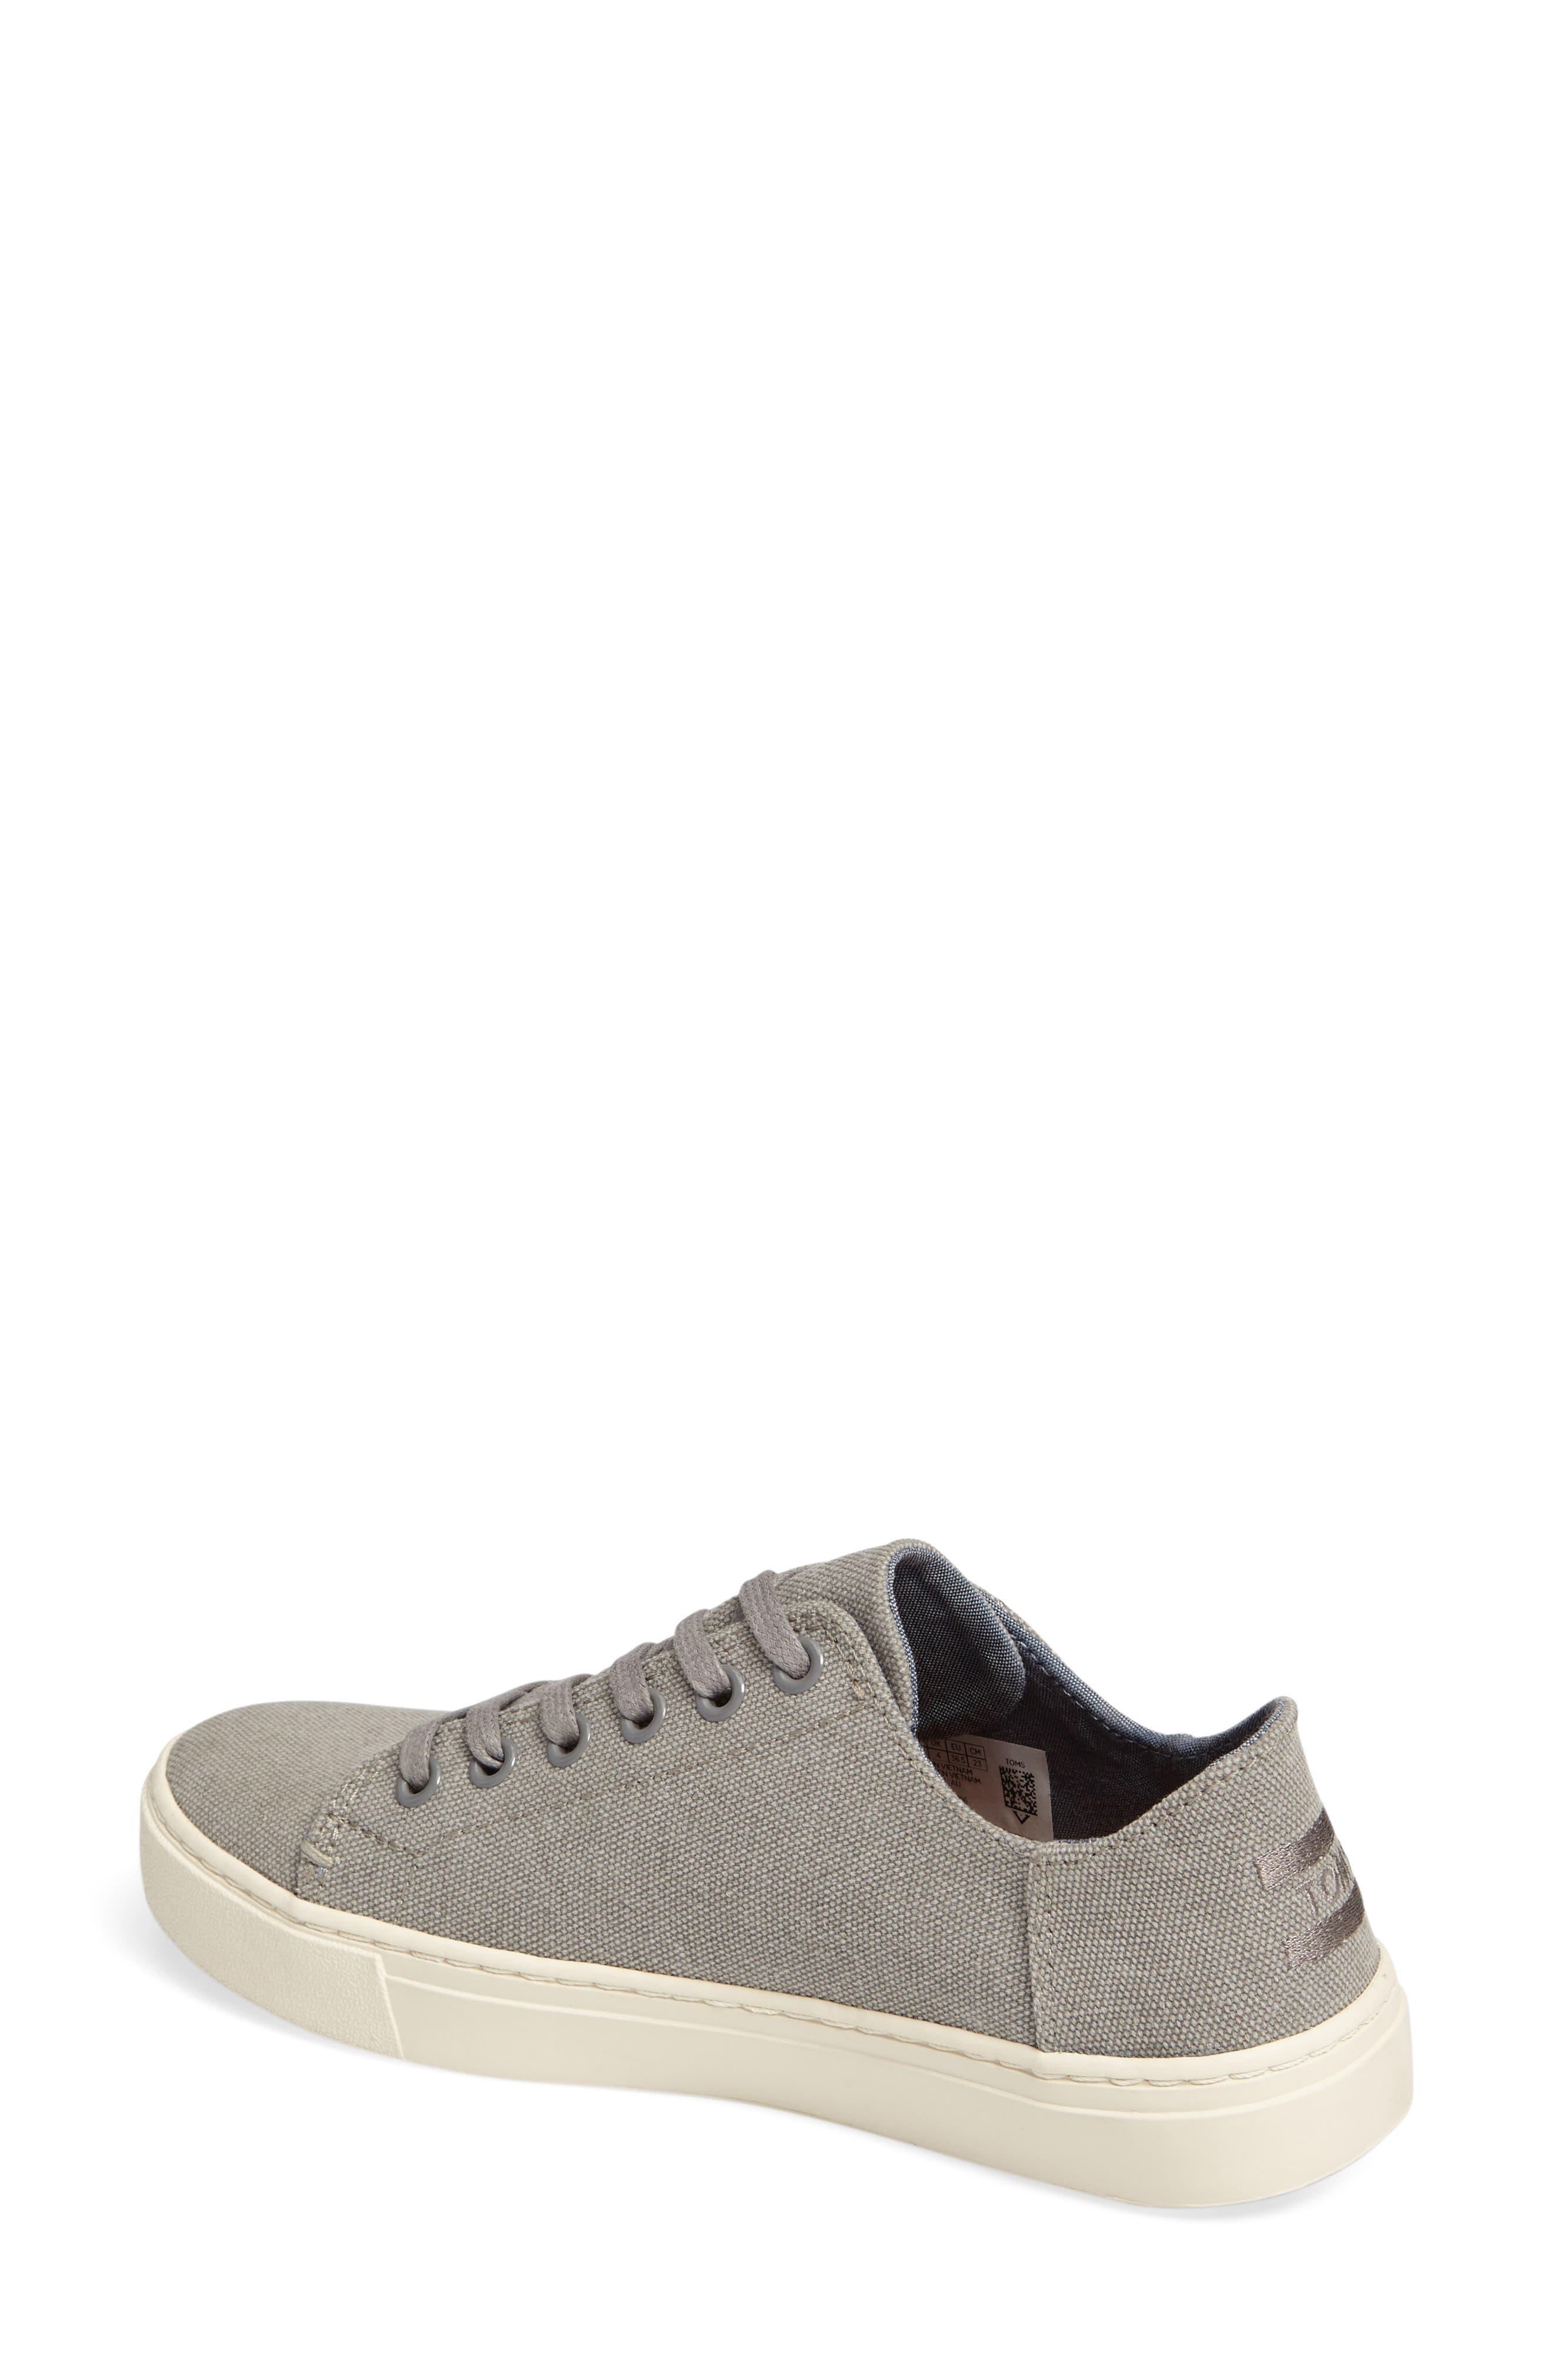 Lenox Sneaker,                             Alternate thumbnail 30, color,